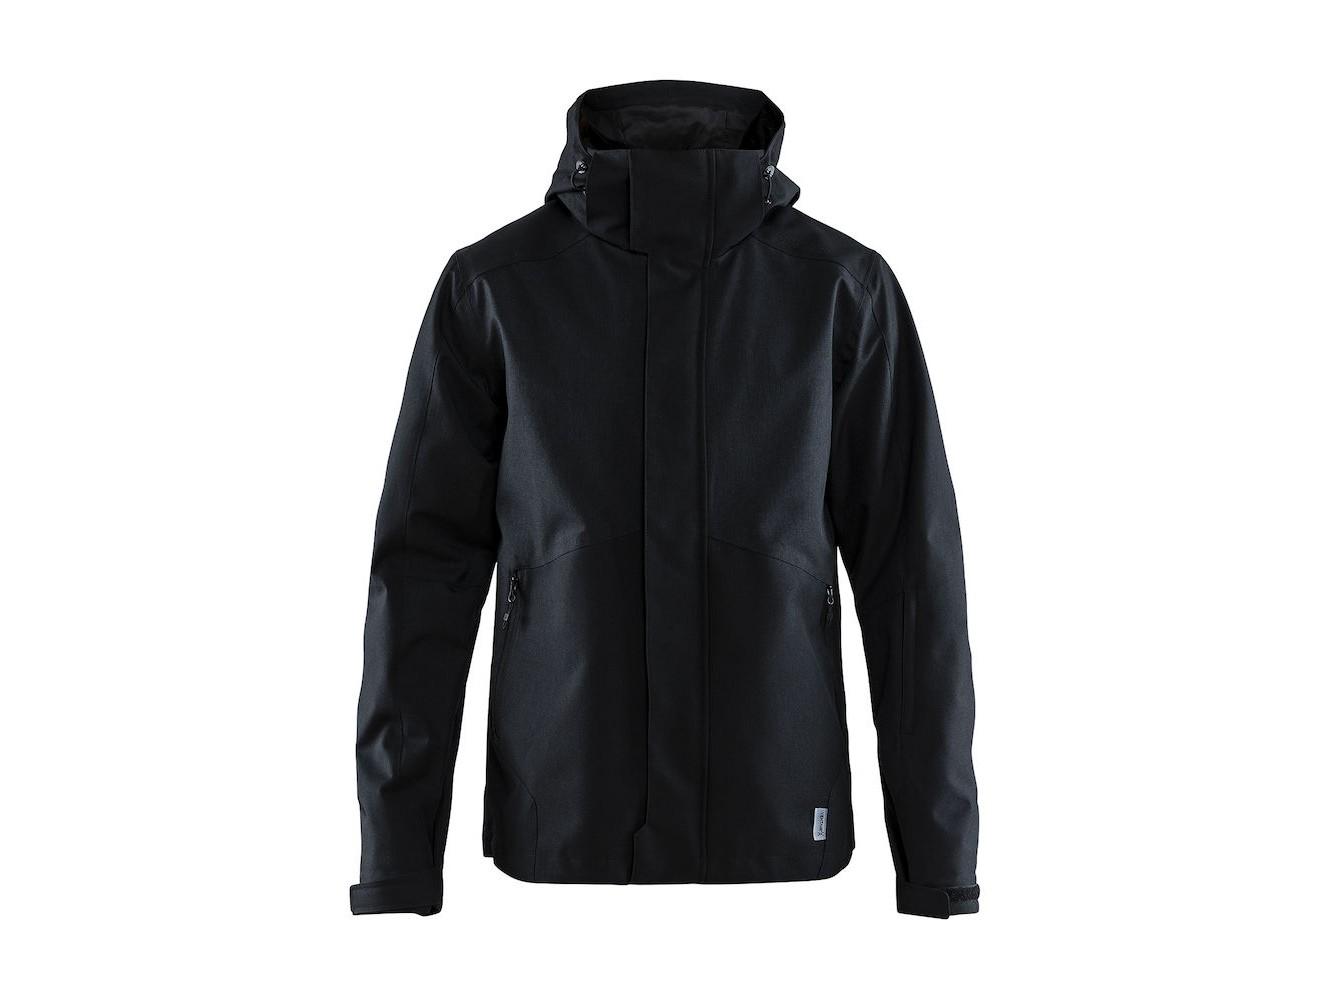 71d97502 Craft Mountain Jacket - Staut Arbeidsklær AS